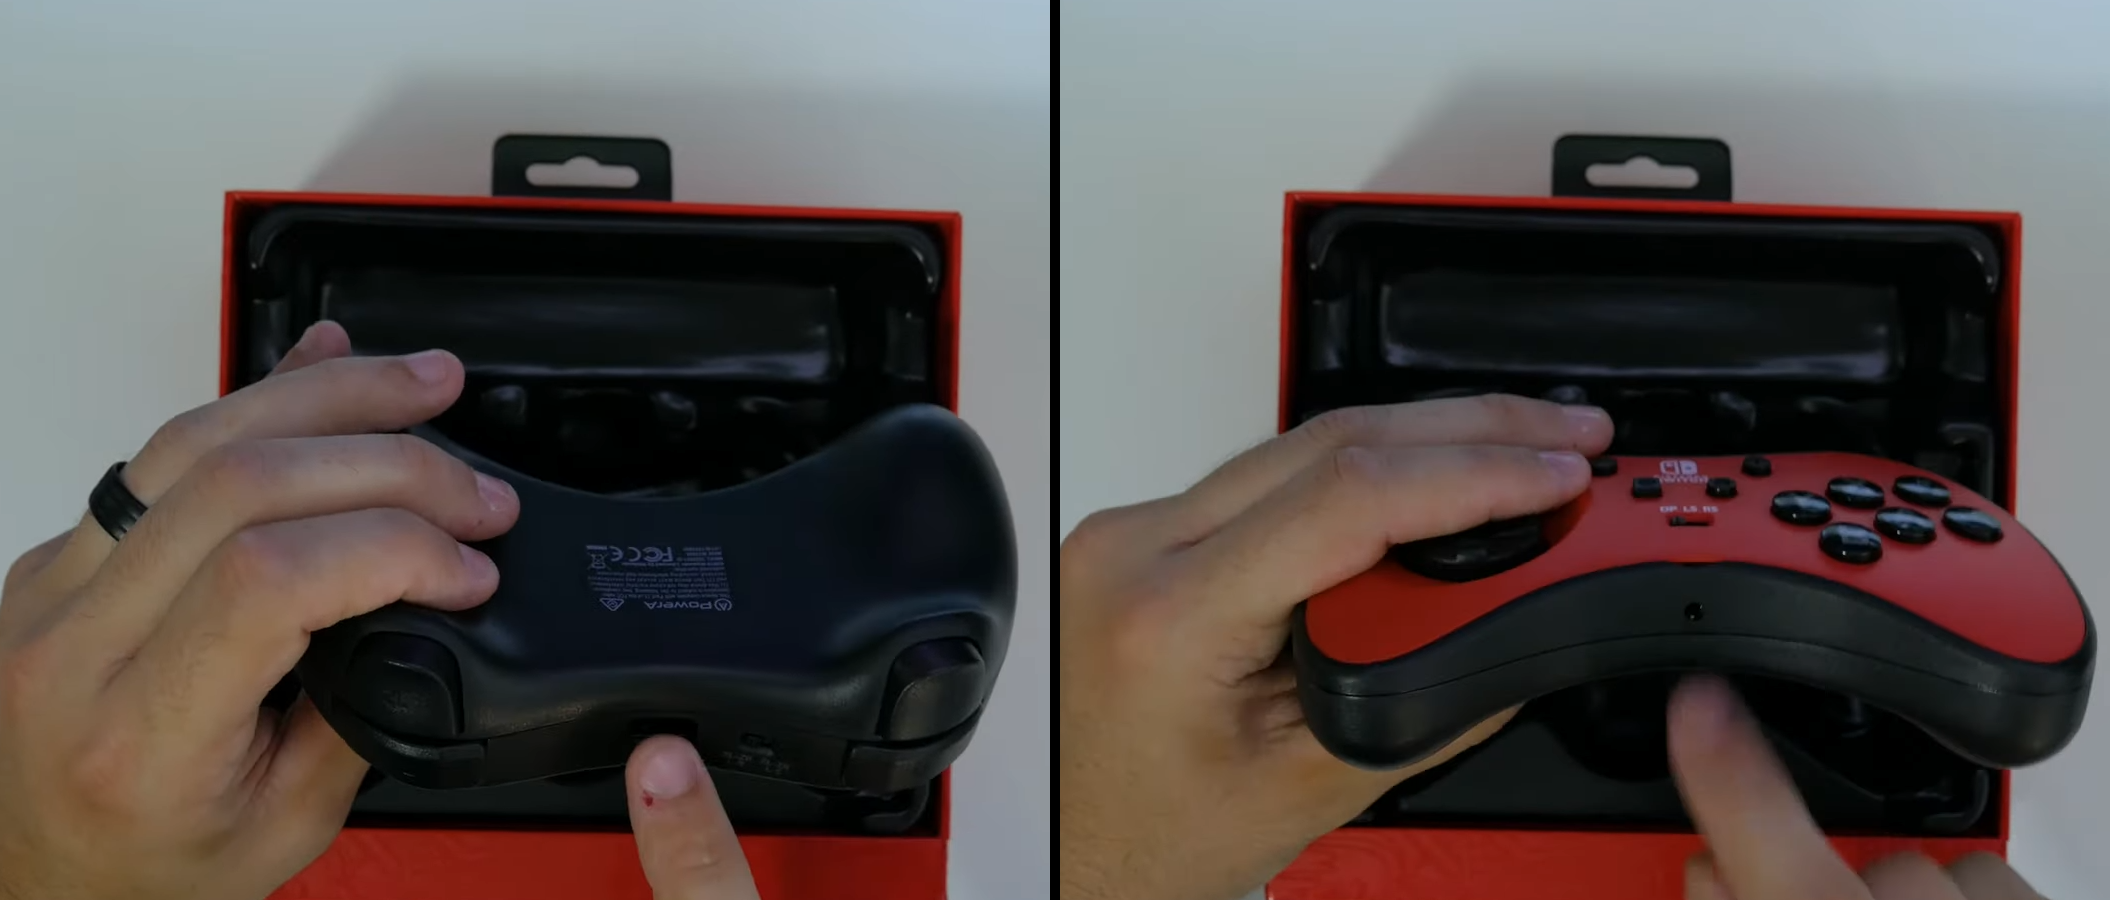 PowerA FUSION Wired FightPad